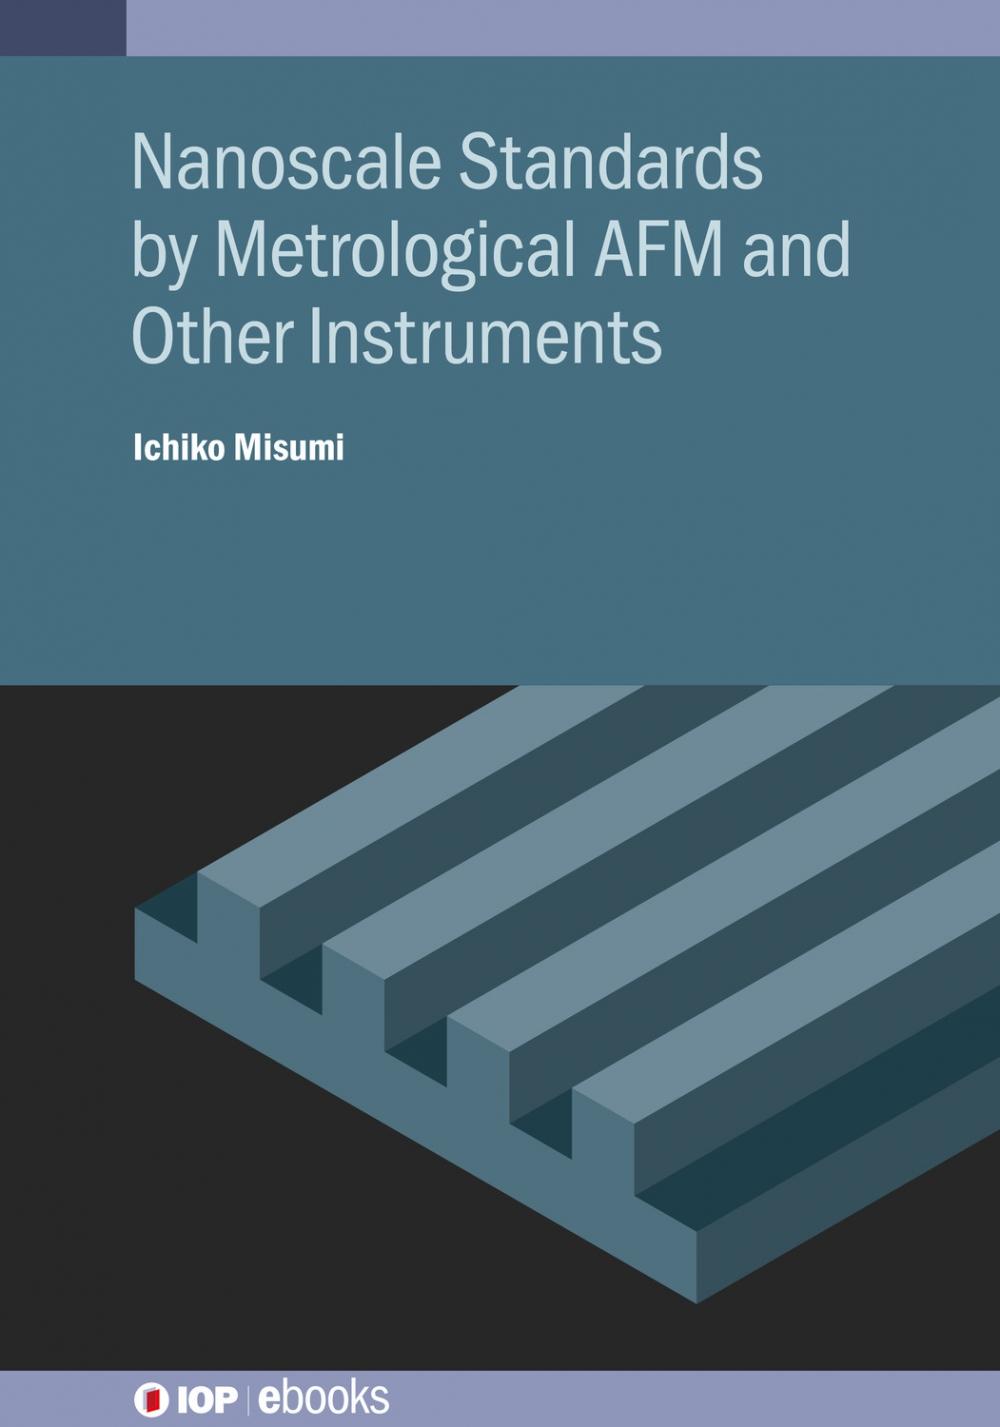 Jacket image for Nanoscale Standards by Metrological AFM and Other Instruments